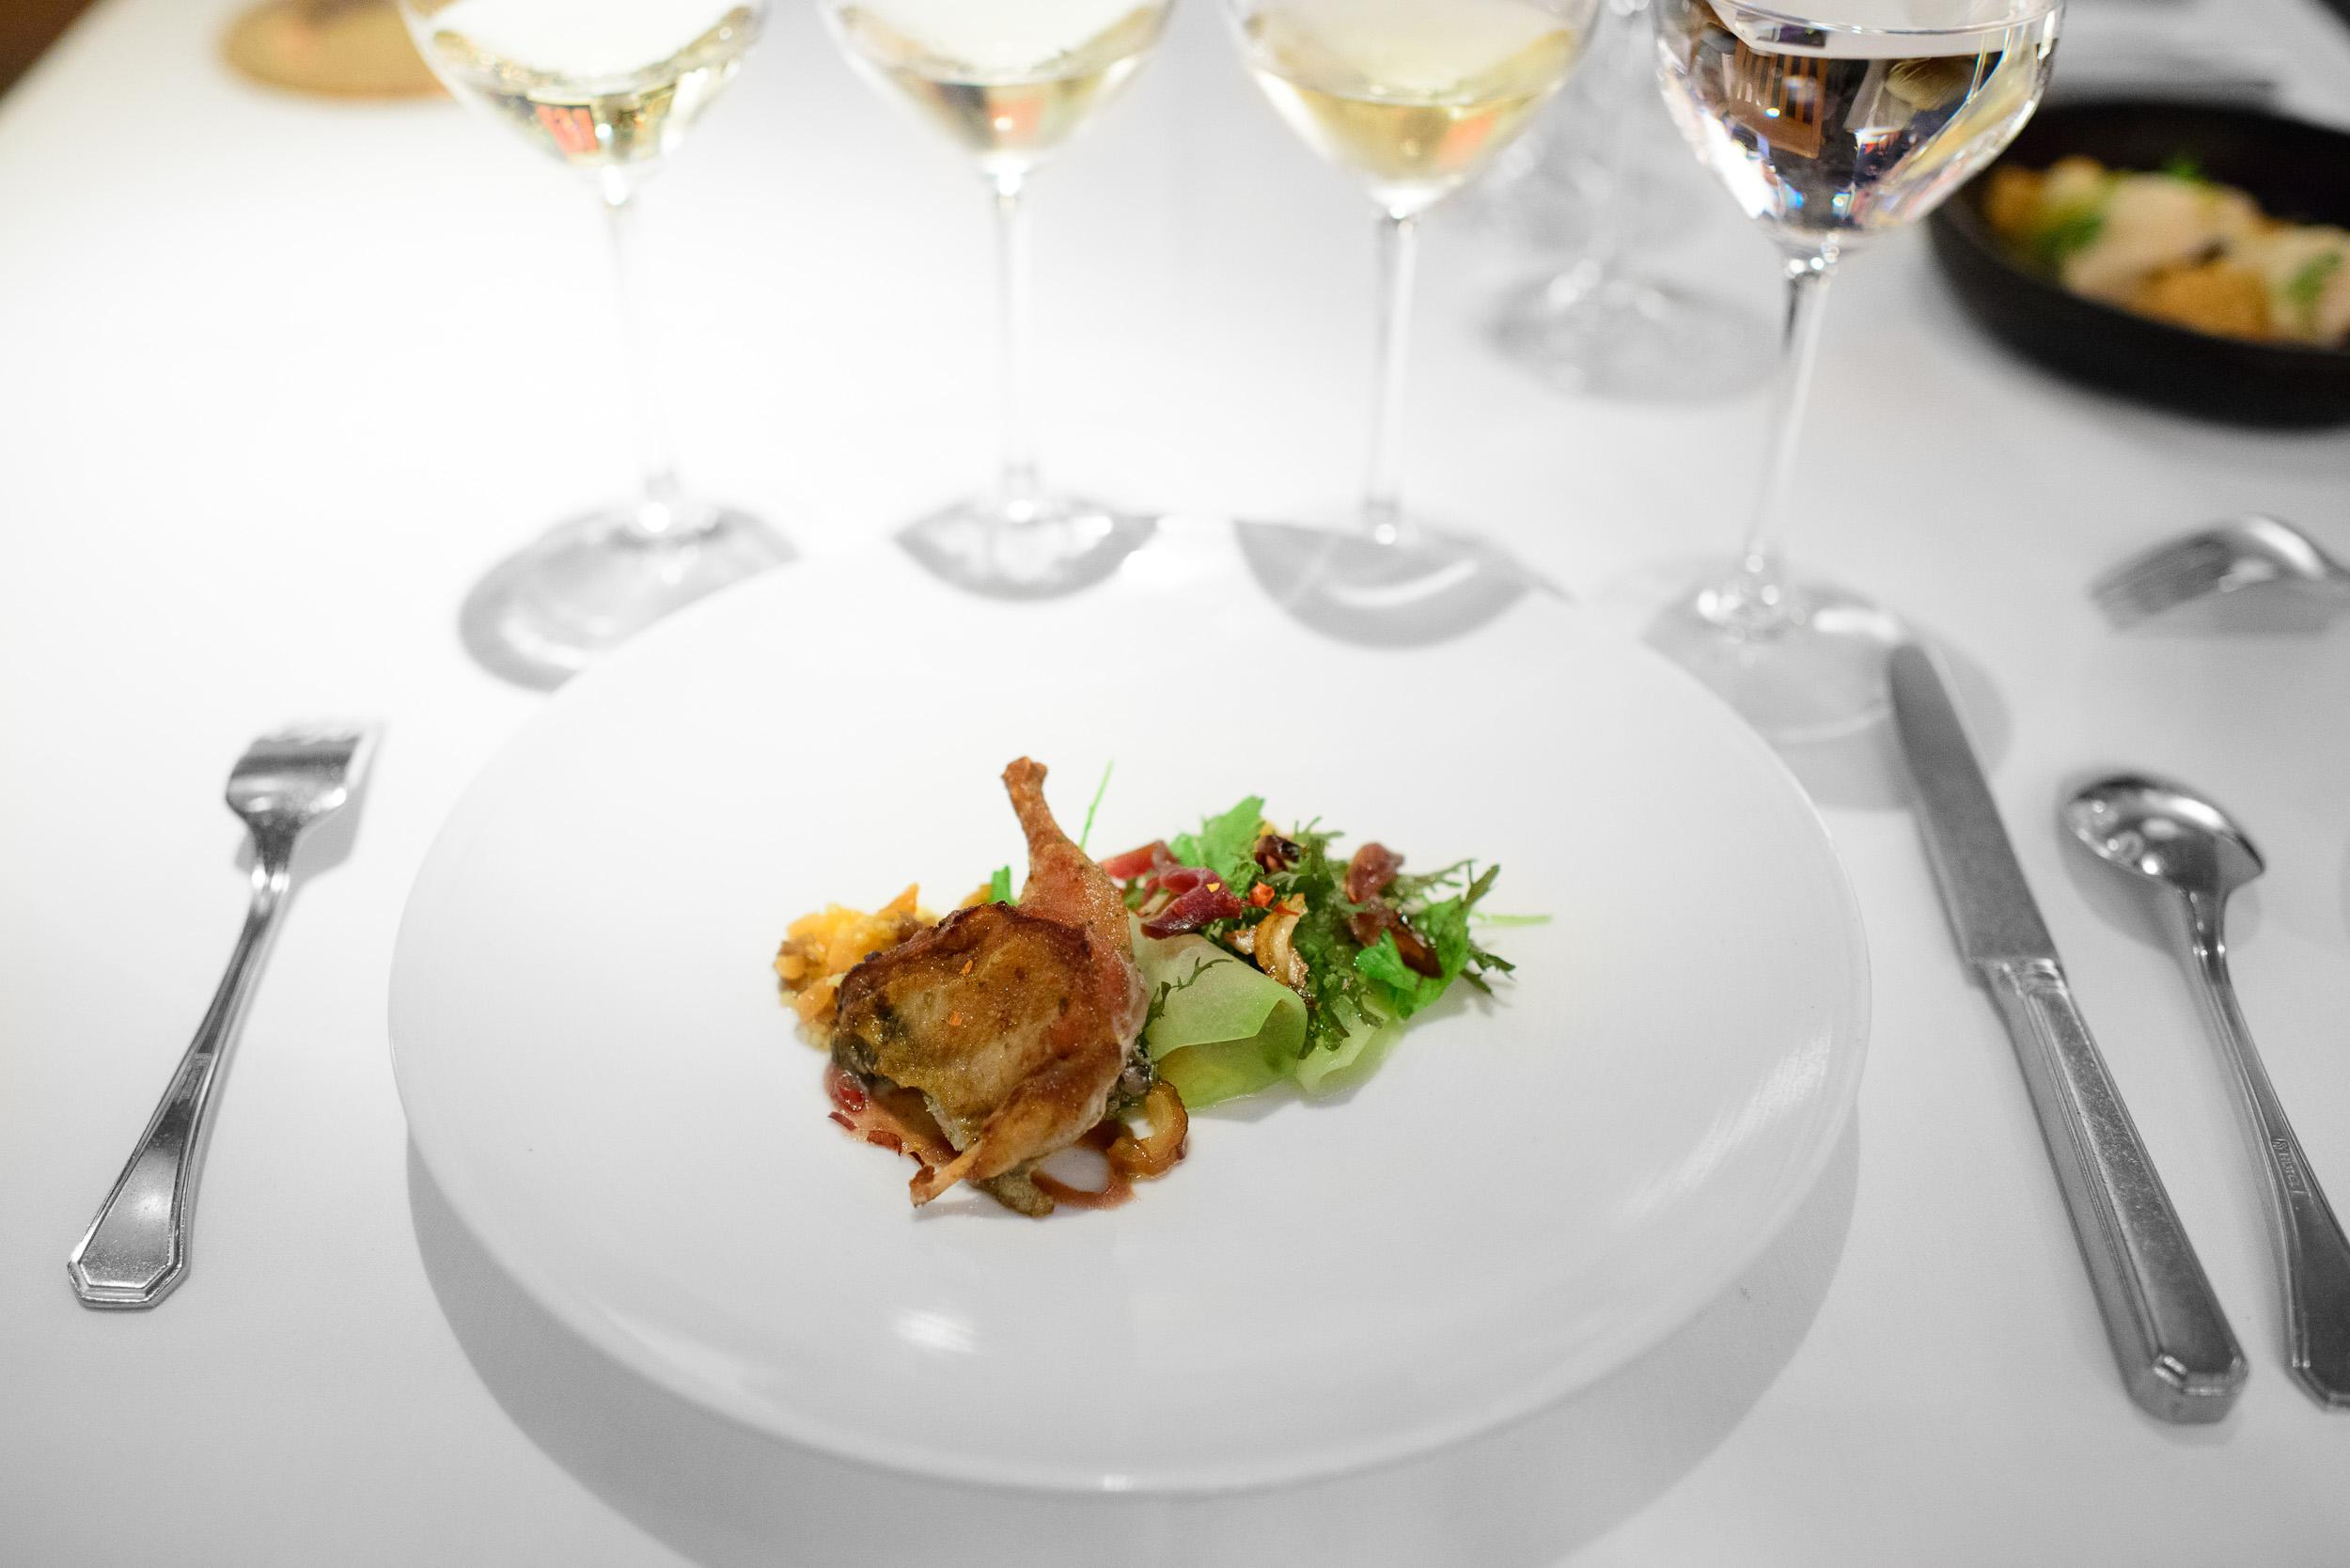 Angry birds - Olivewood-smomked quail, salsa mach (bird food, su